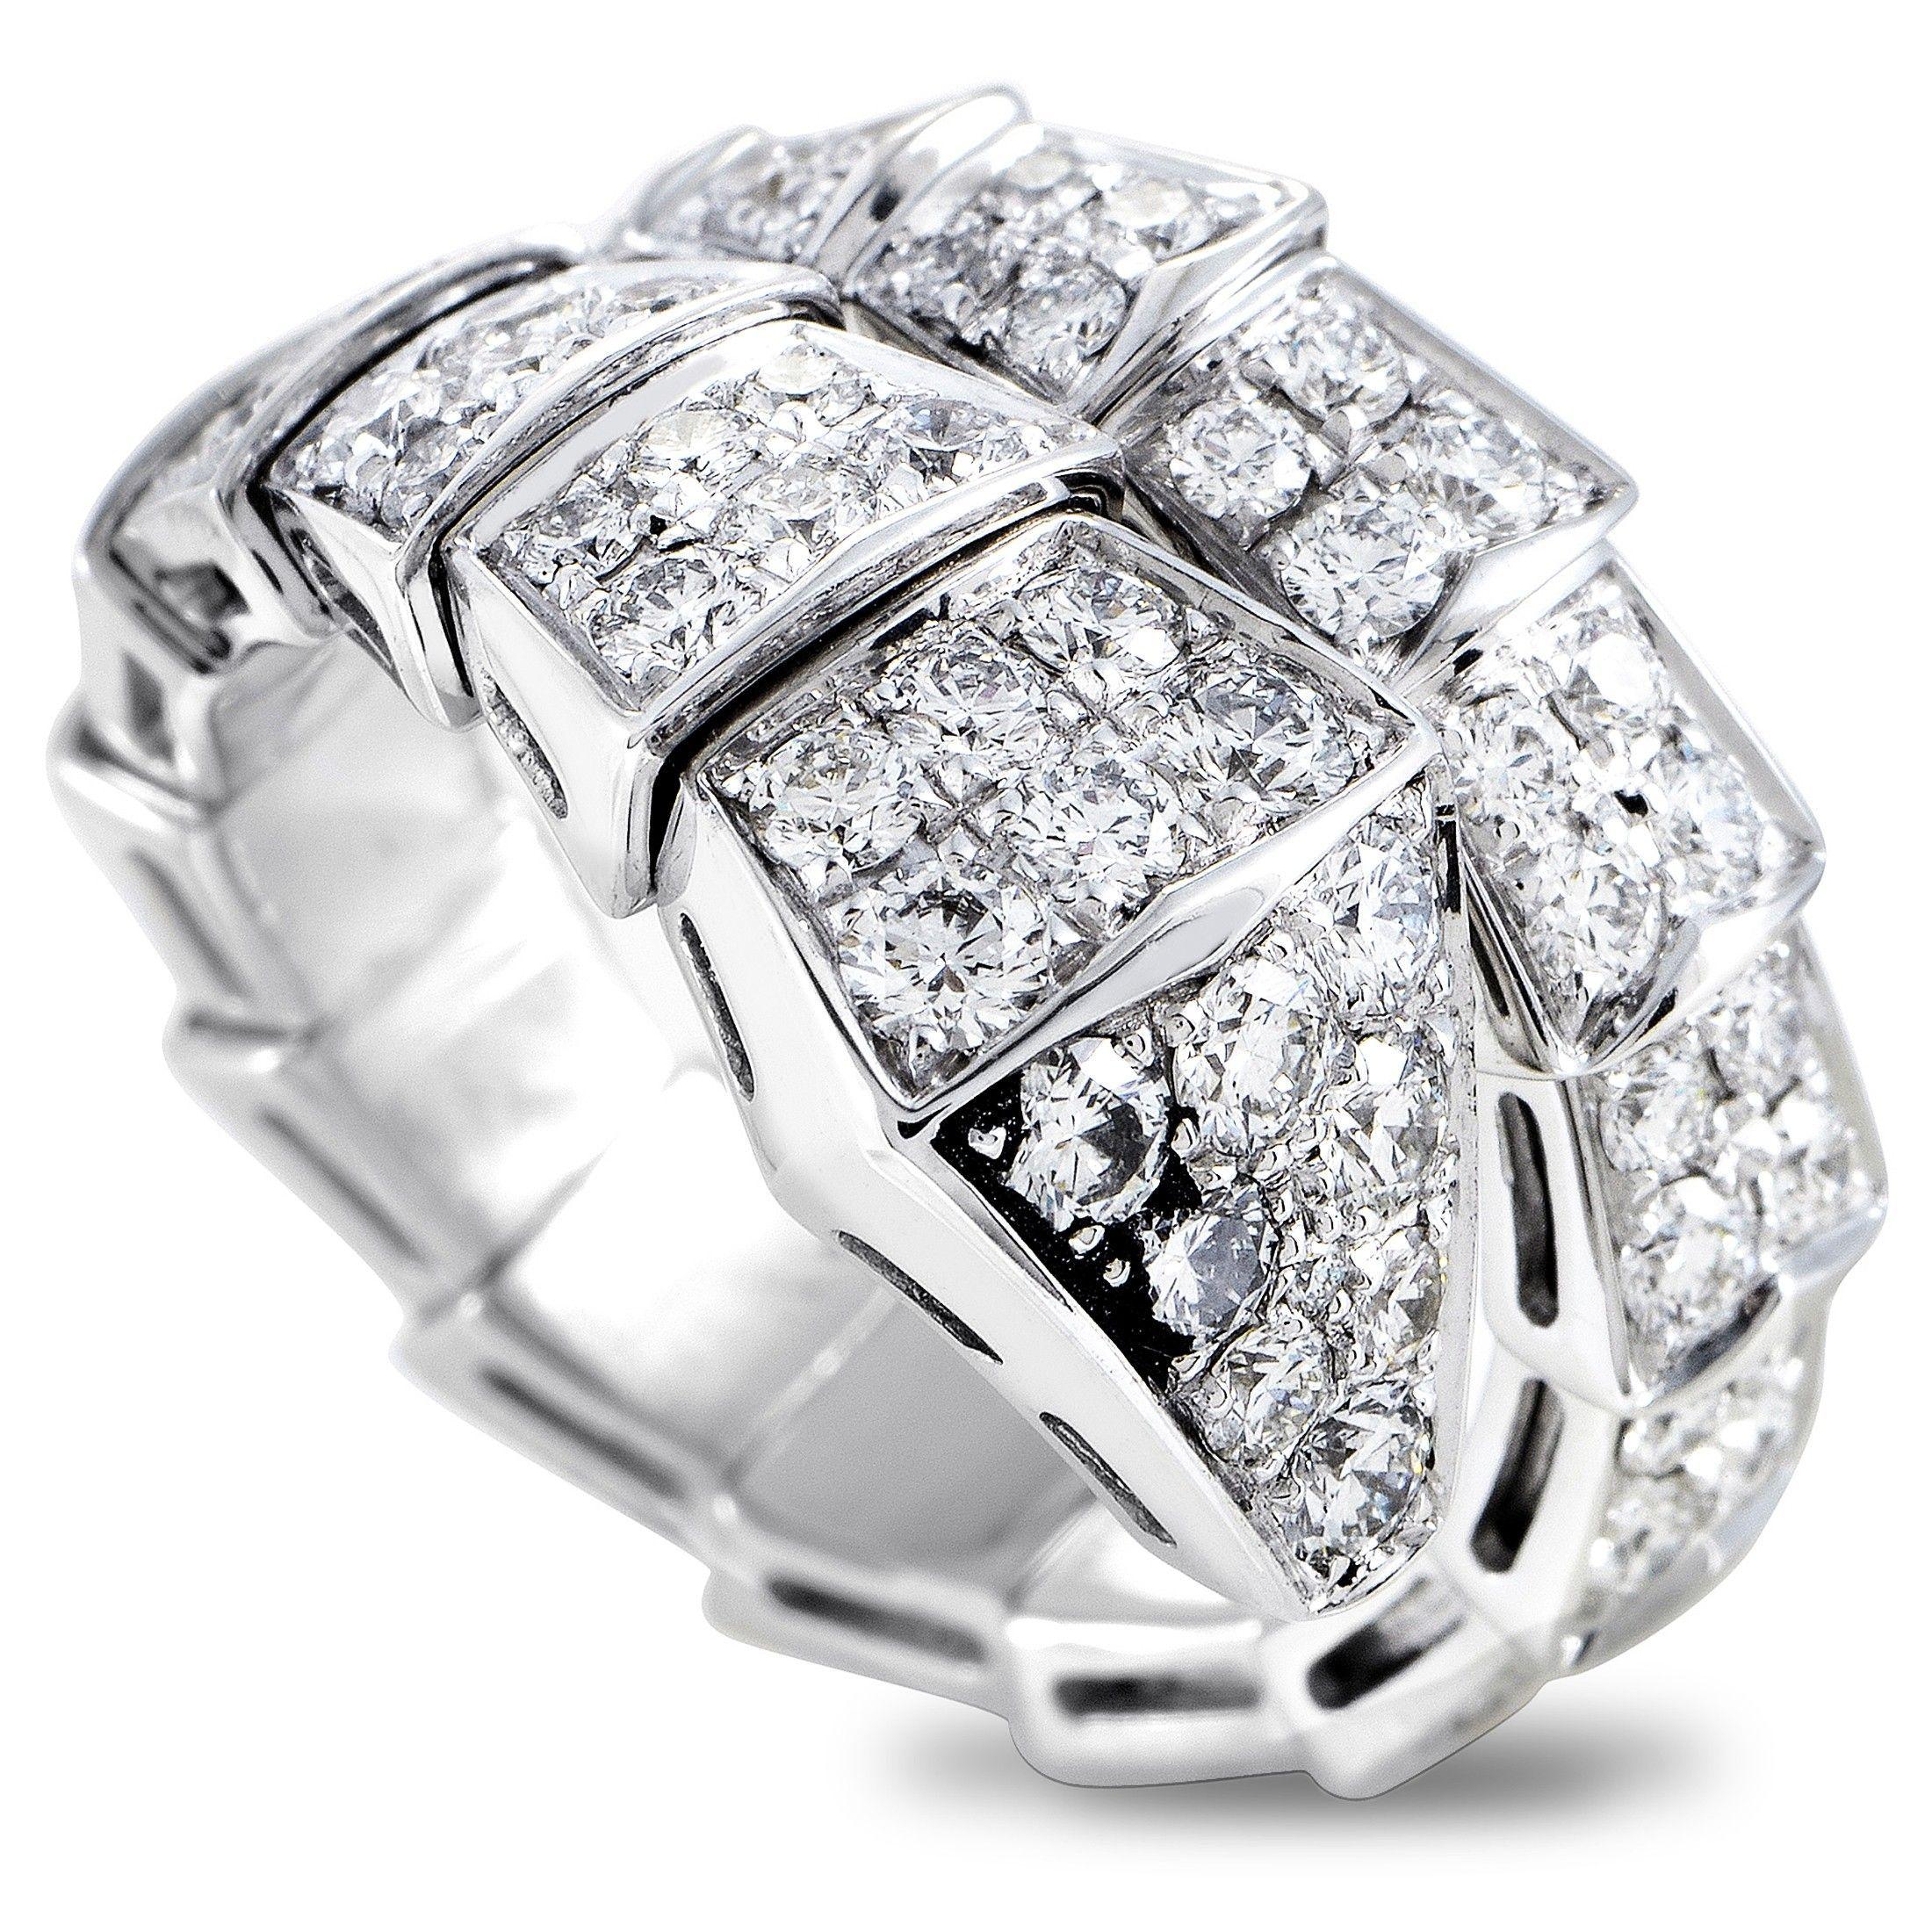 5838fd3c252d3 Bvlgari Serpenti 18K White Gold Full Diamond Pave Snake Ring Size Large